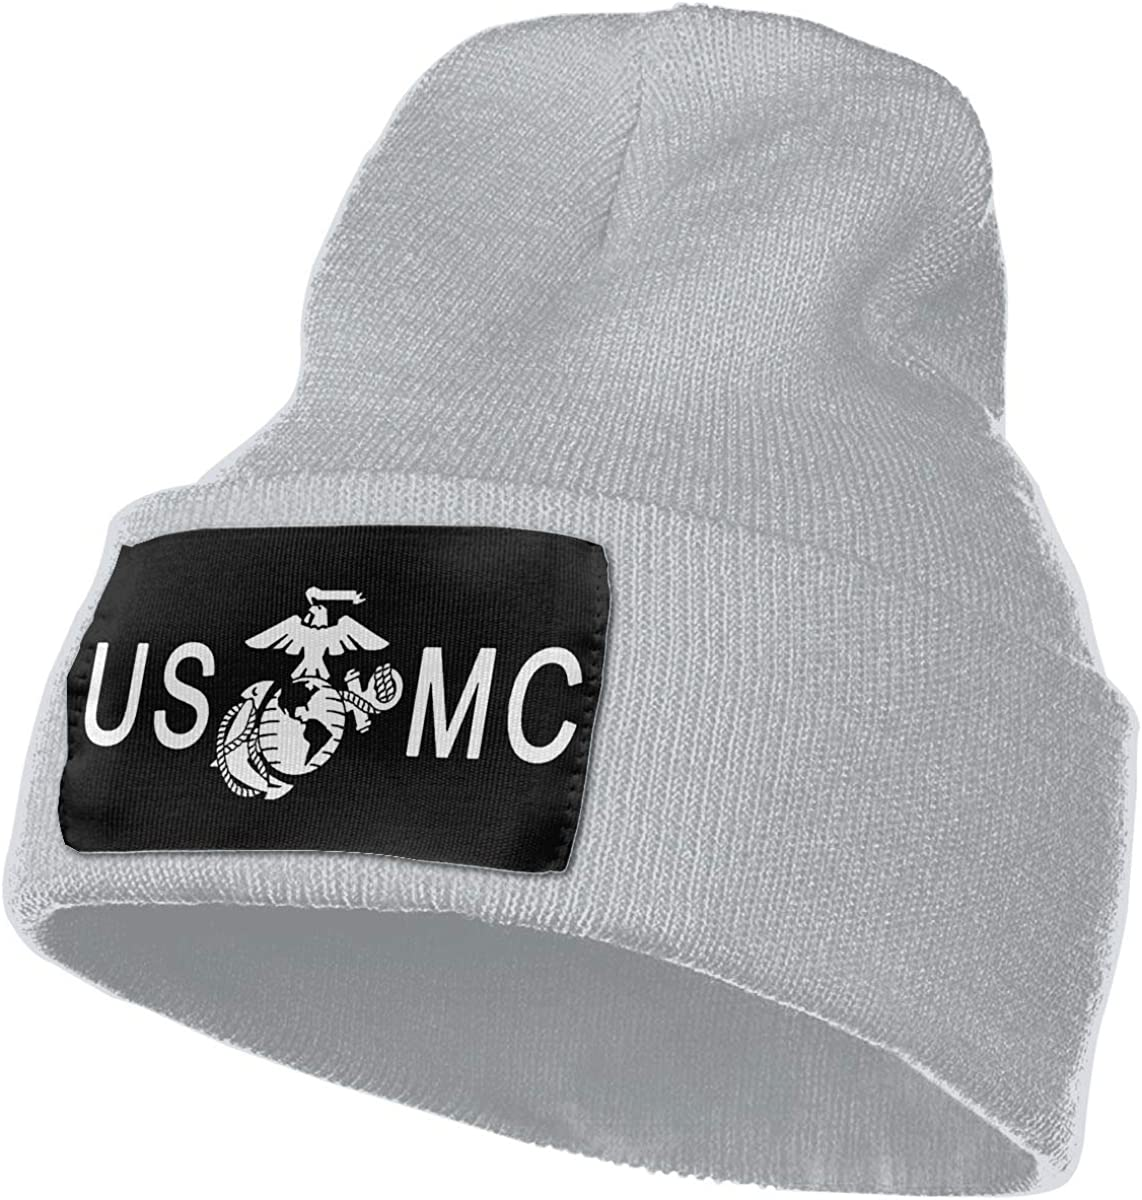 SLADDD1 USMC Warm Winter Hat Knit Beanie Skull Cap Cuff Beanie Hat Winter Hats for Men /& Women